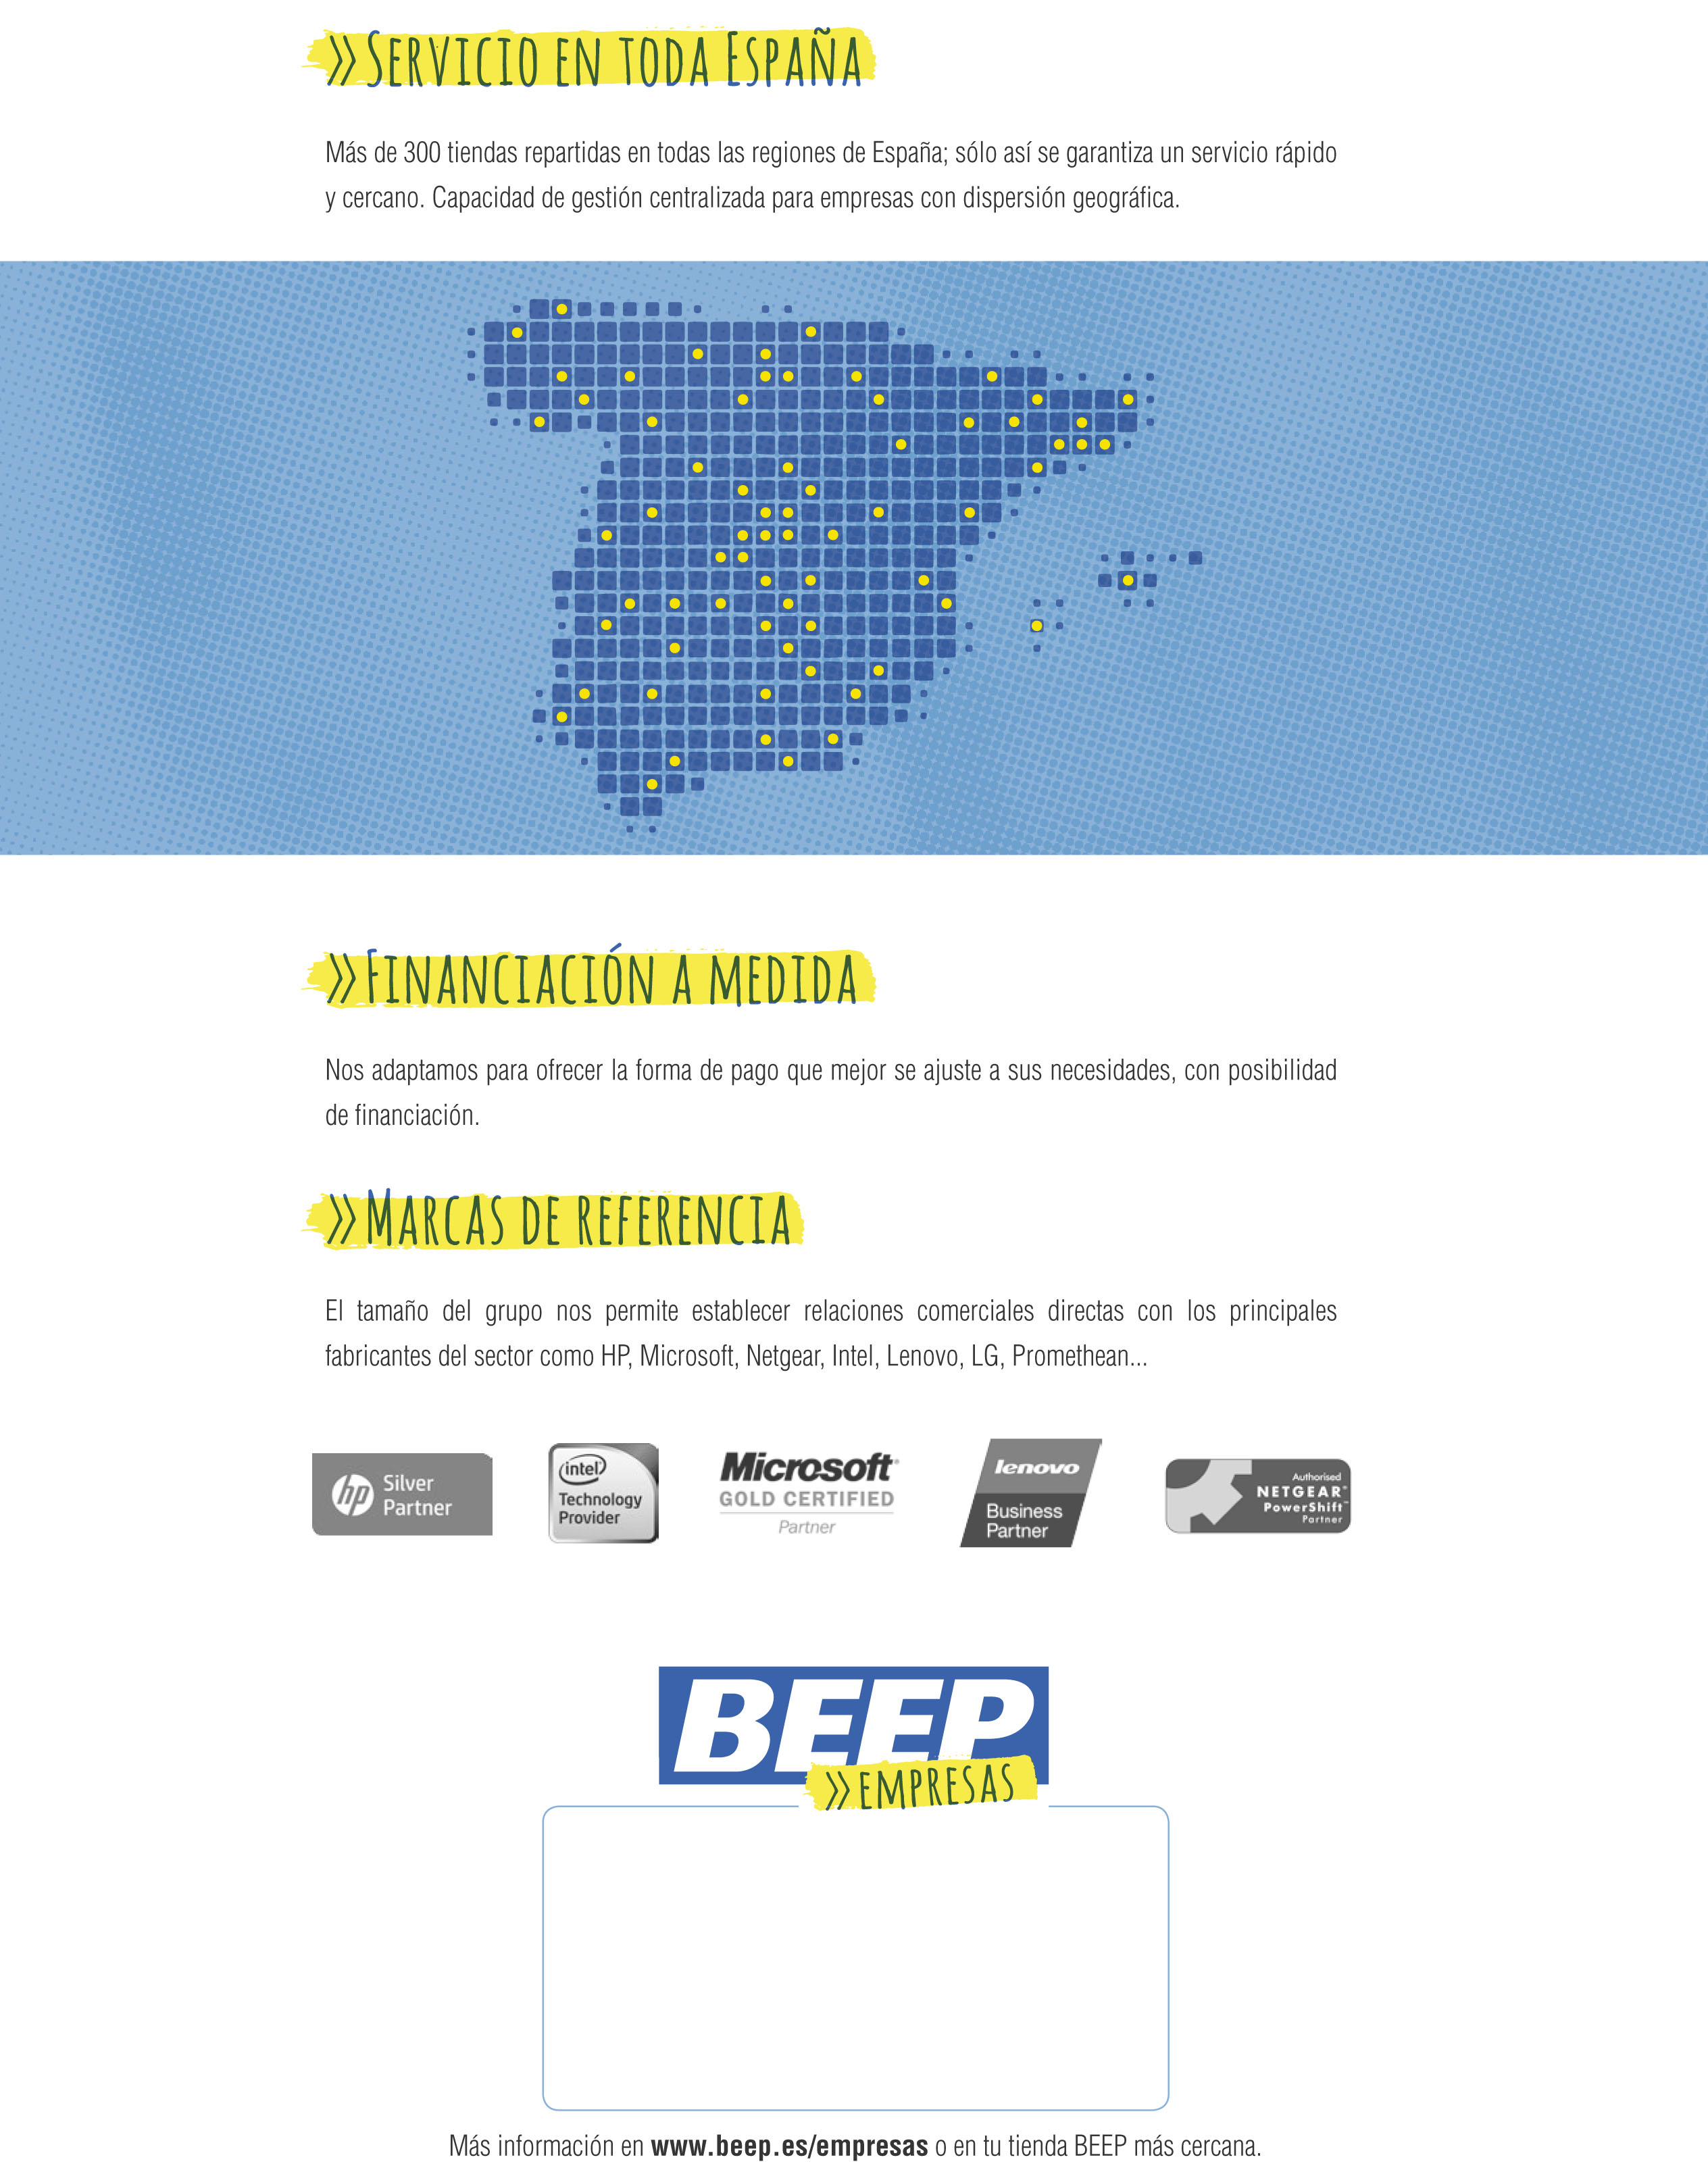 COMPANY BEEP EMPRESAS ESP-6